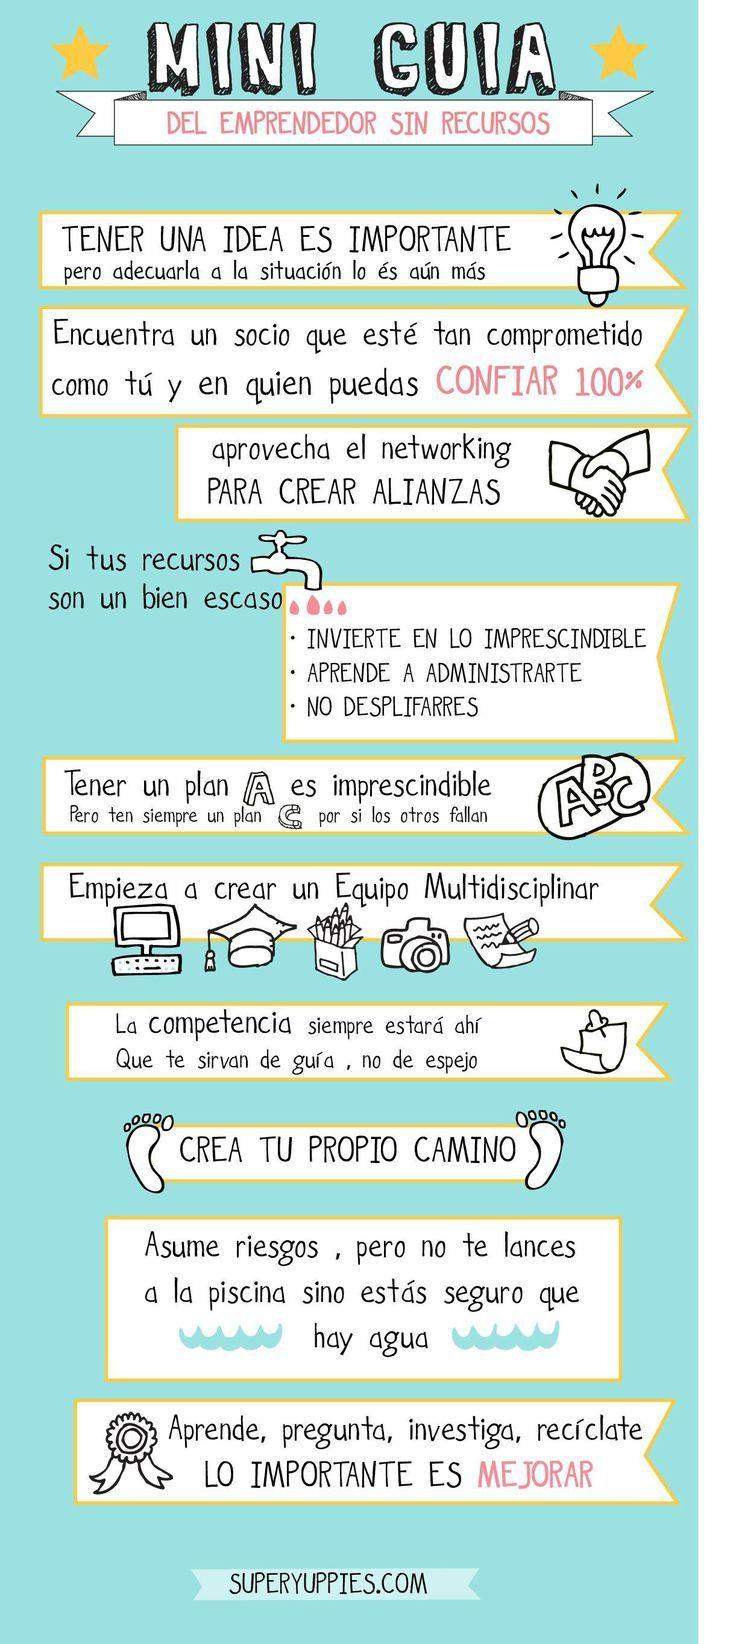 Mini guía para emprendedores! #umayor #emprendedores #estudiantes